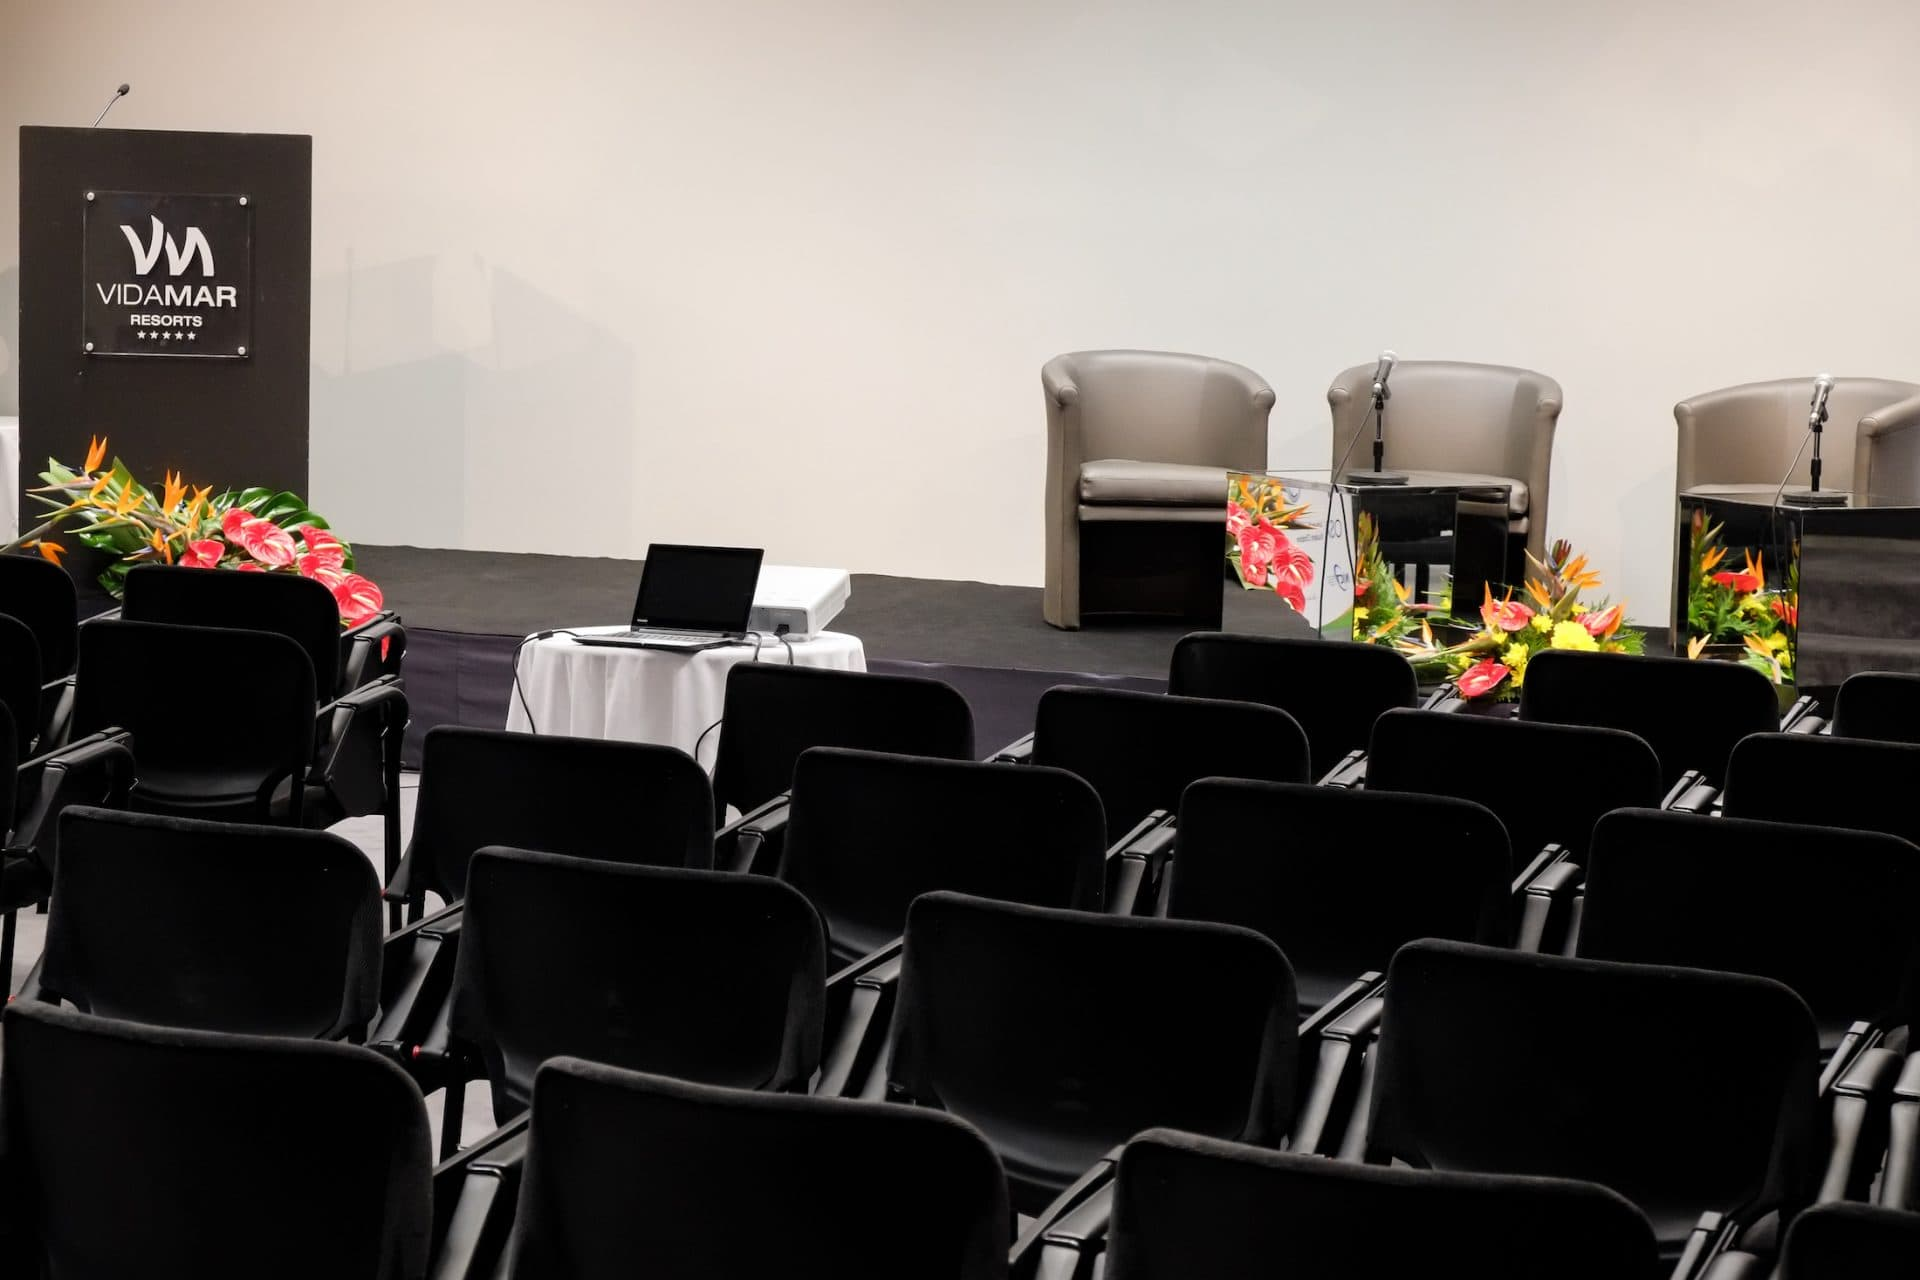 meetings-events-rooms-VidaMar-hotels-resorts-madeira